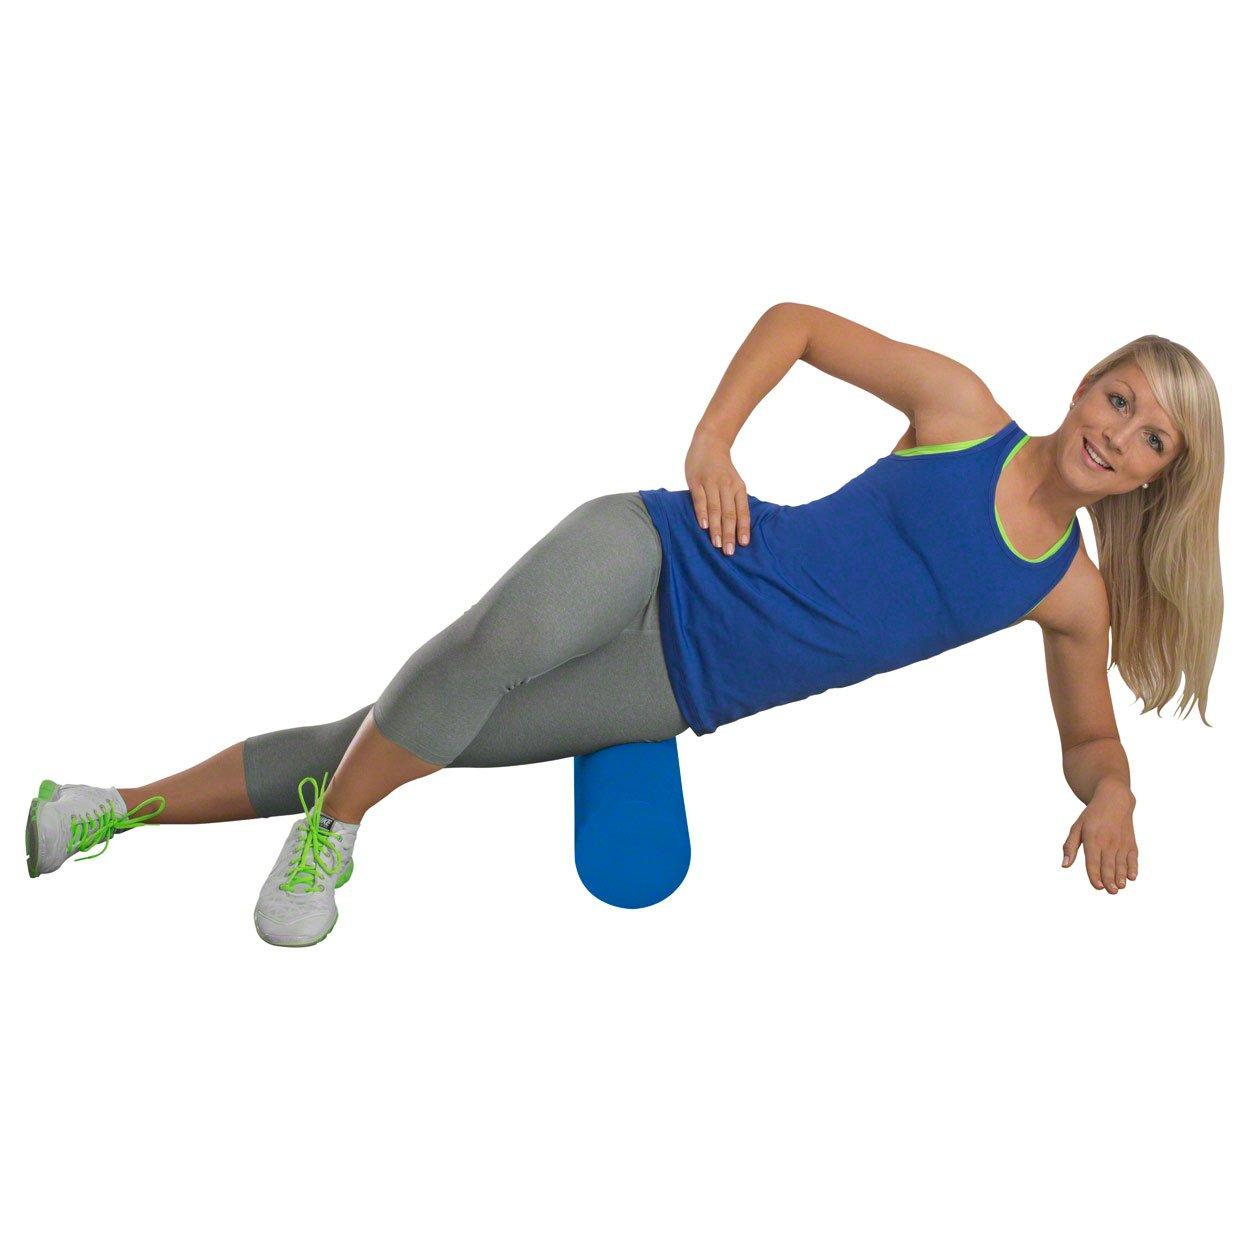 softX® Faszien-Rolle 145 Mini 30cm lang Ø14,5cm Selbstmassage Balance weich blau